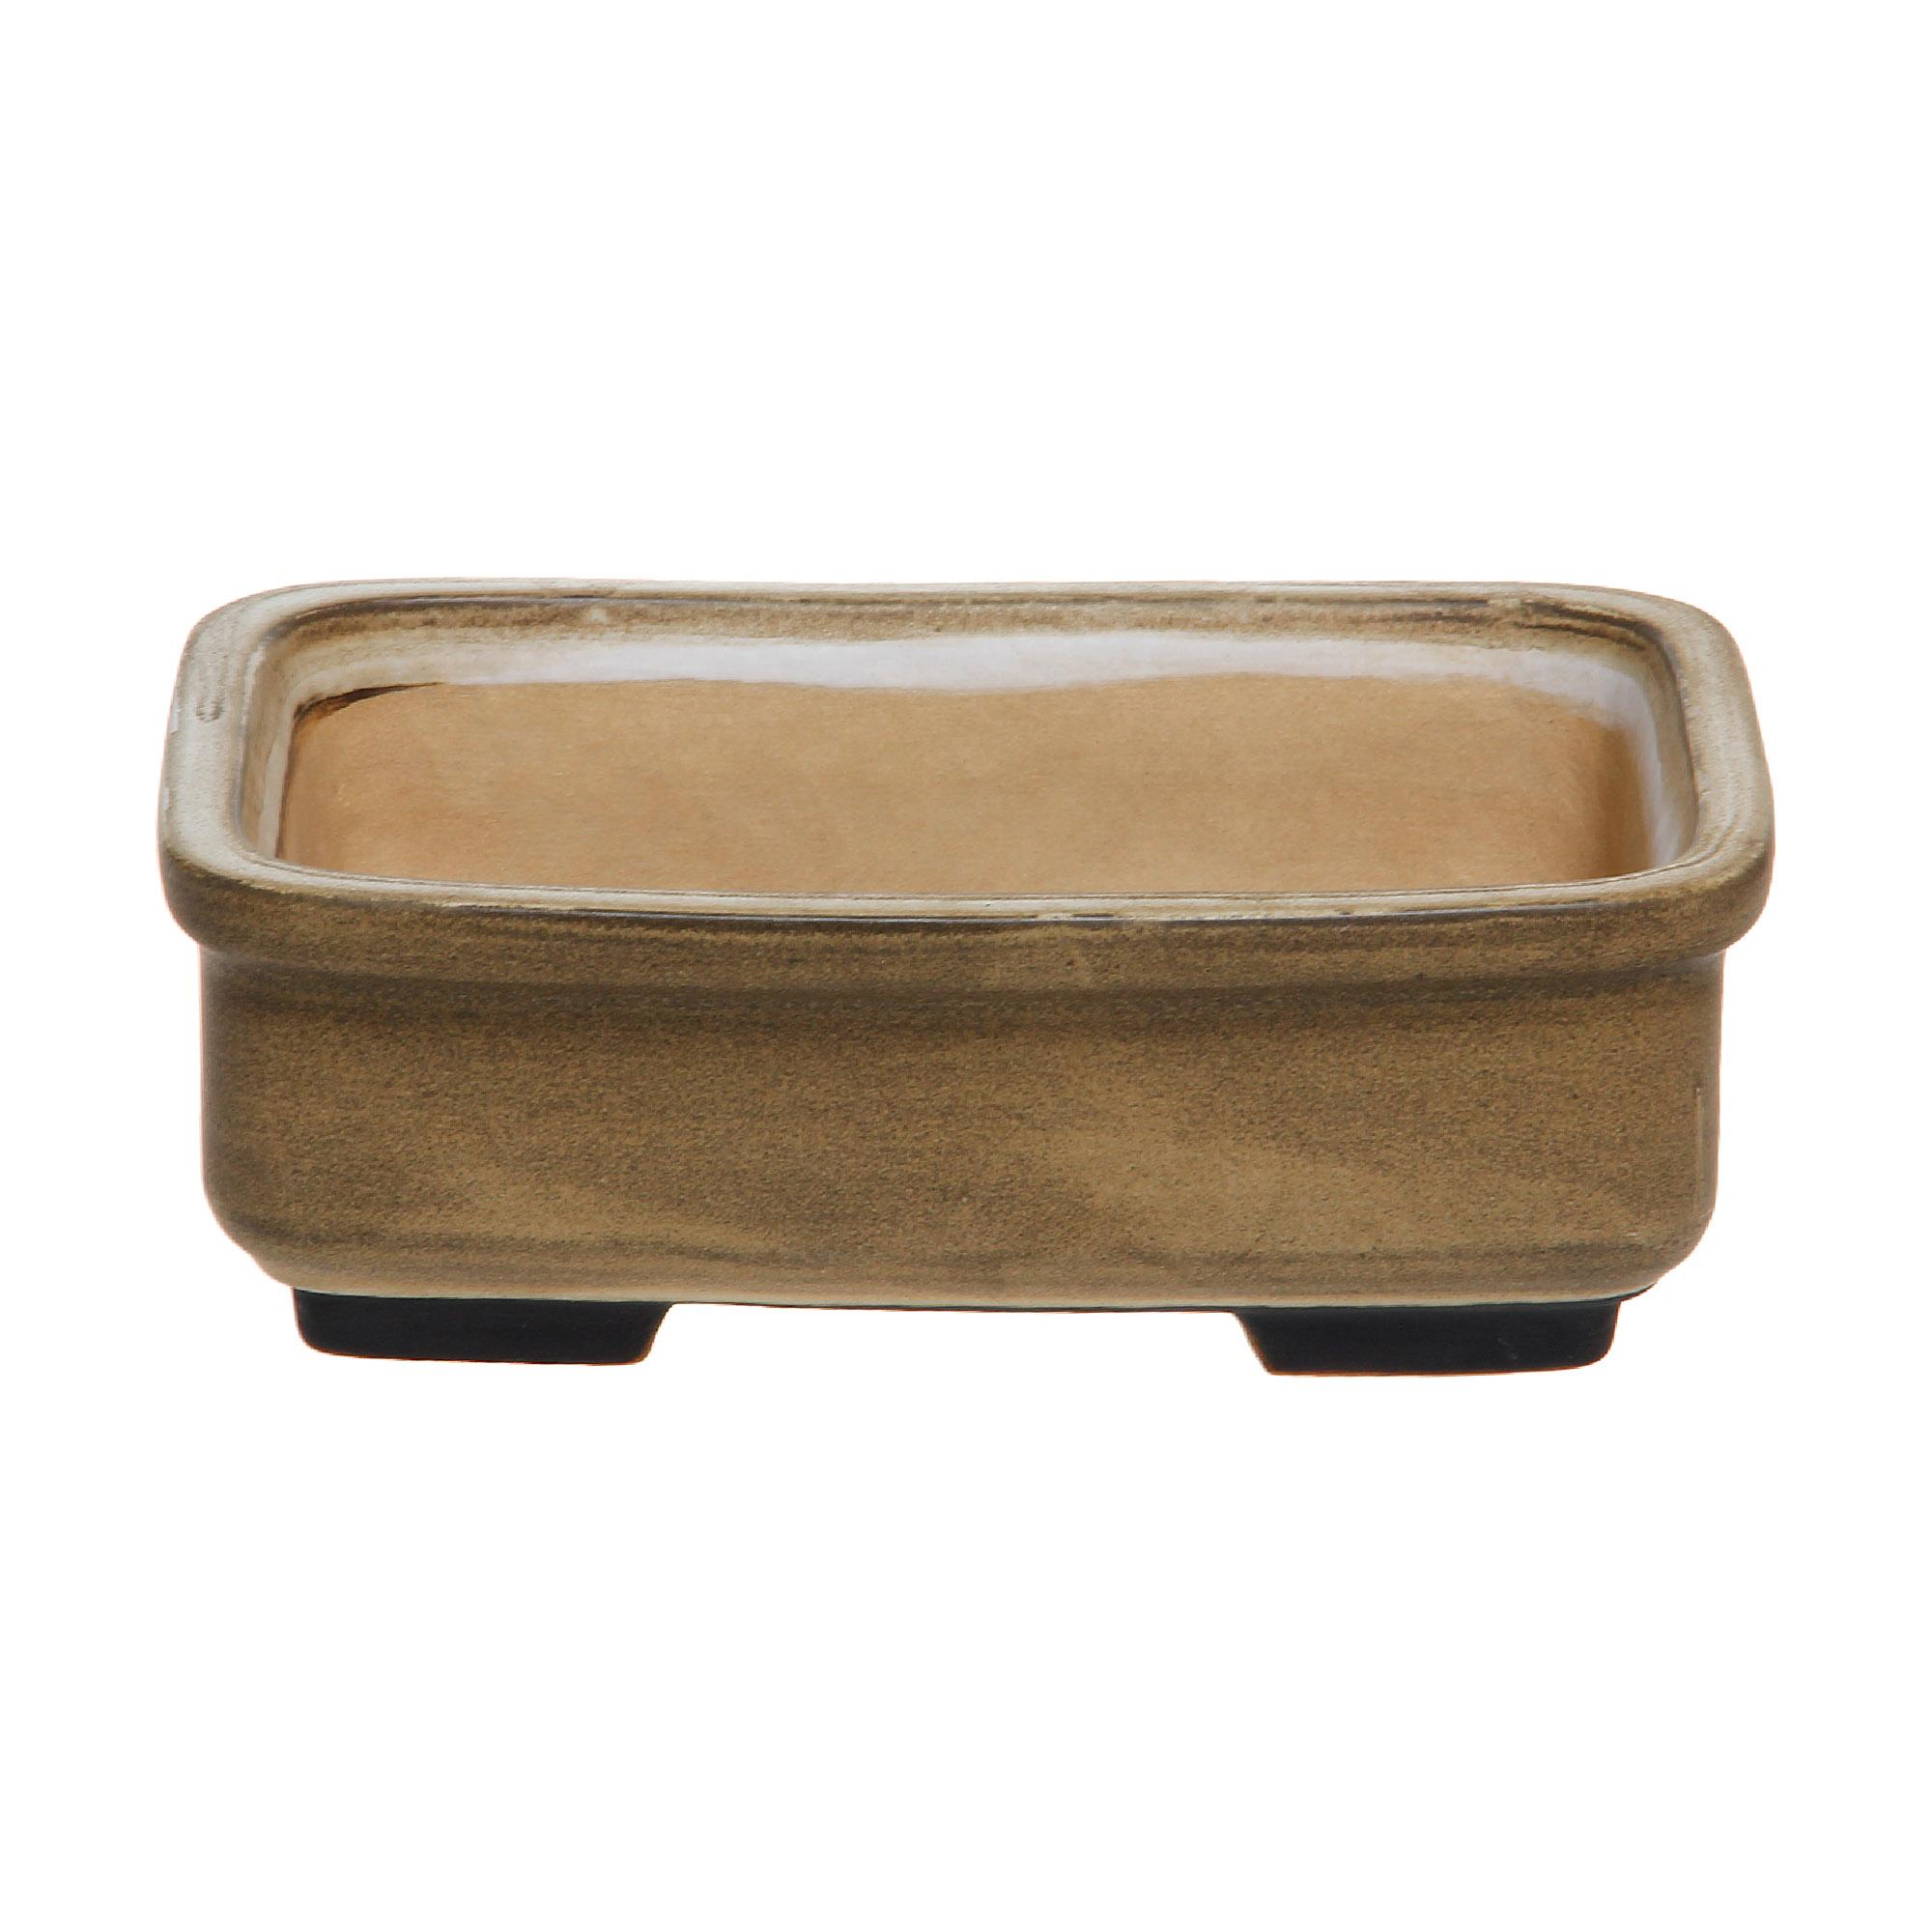 Кашпо Lodder ceram glazed rectangle №6 21x17x7 см